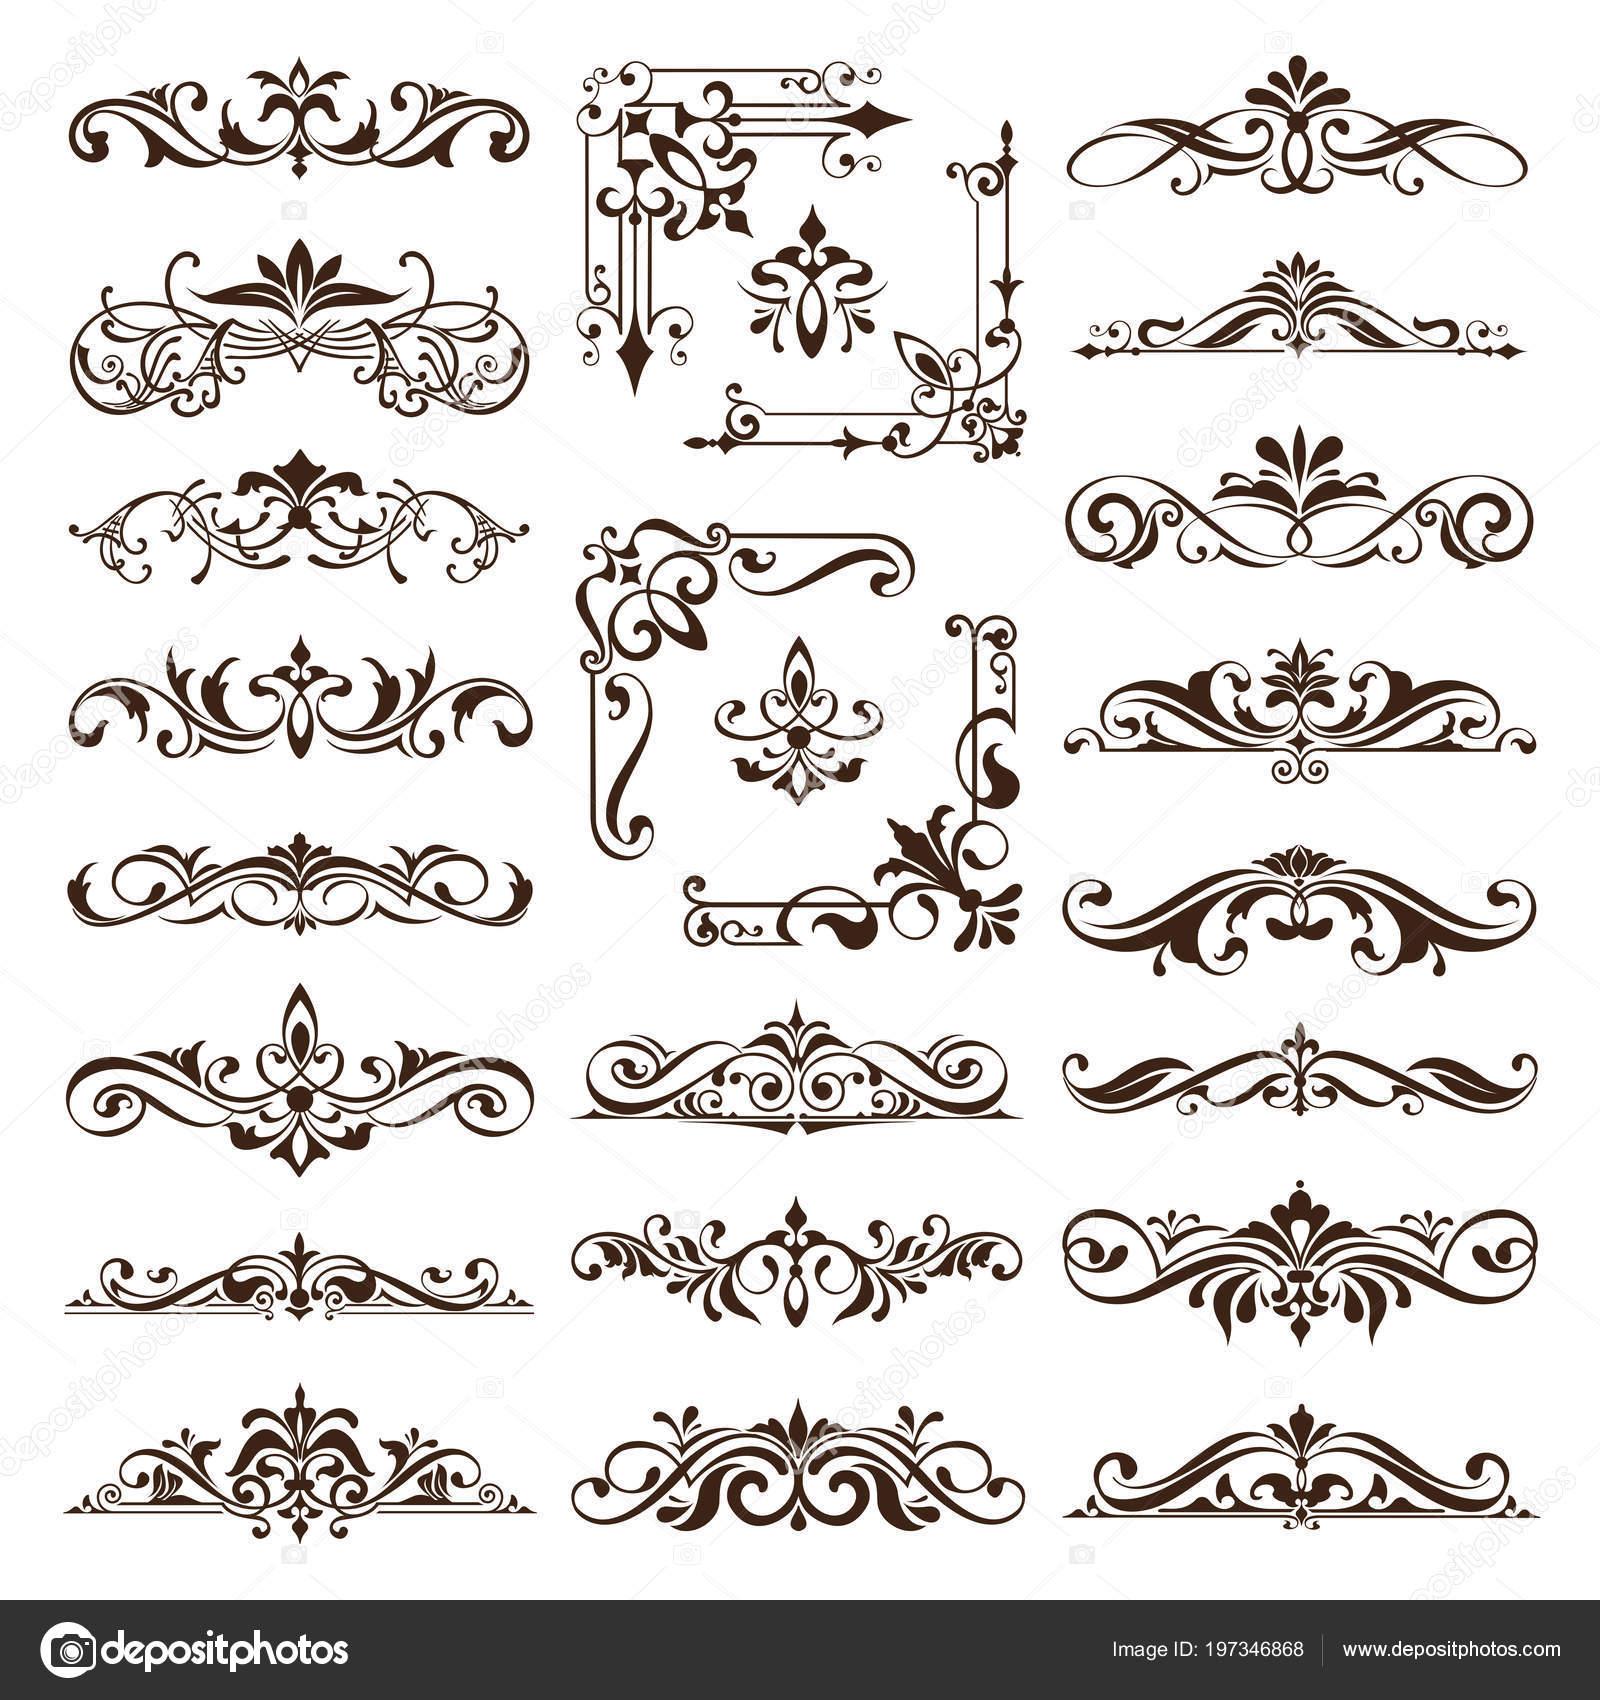 Vintage Design Elemente Ornamente Rahmen Ecken Bordsteine Retro ...